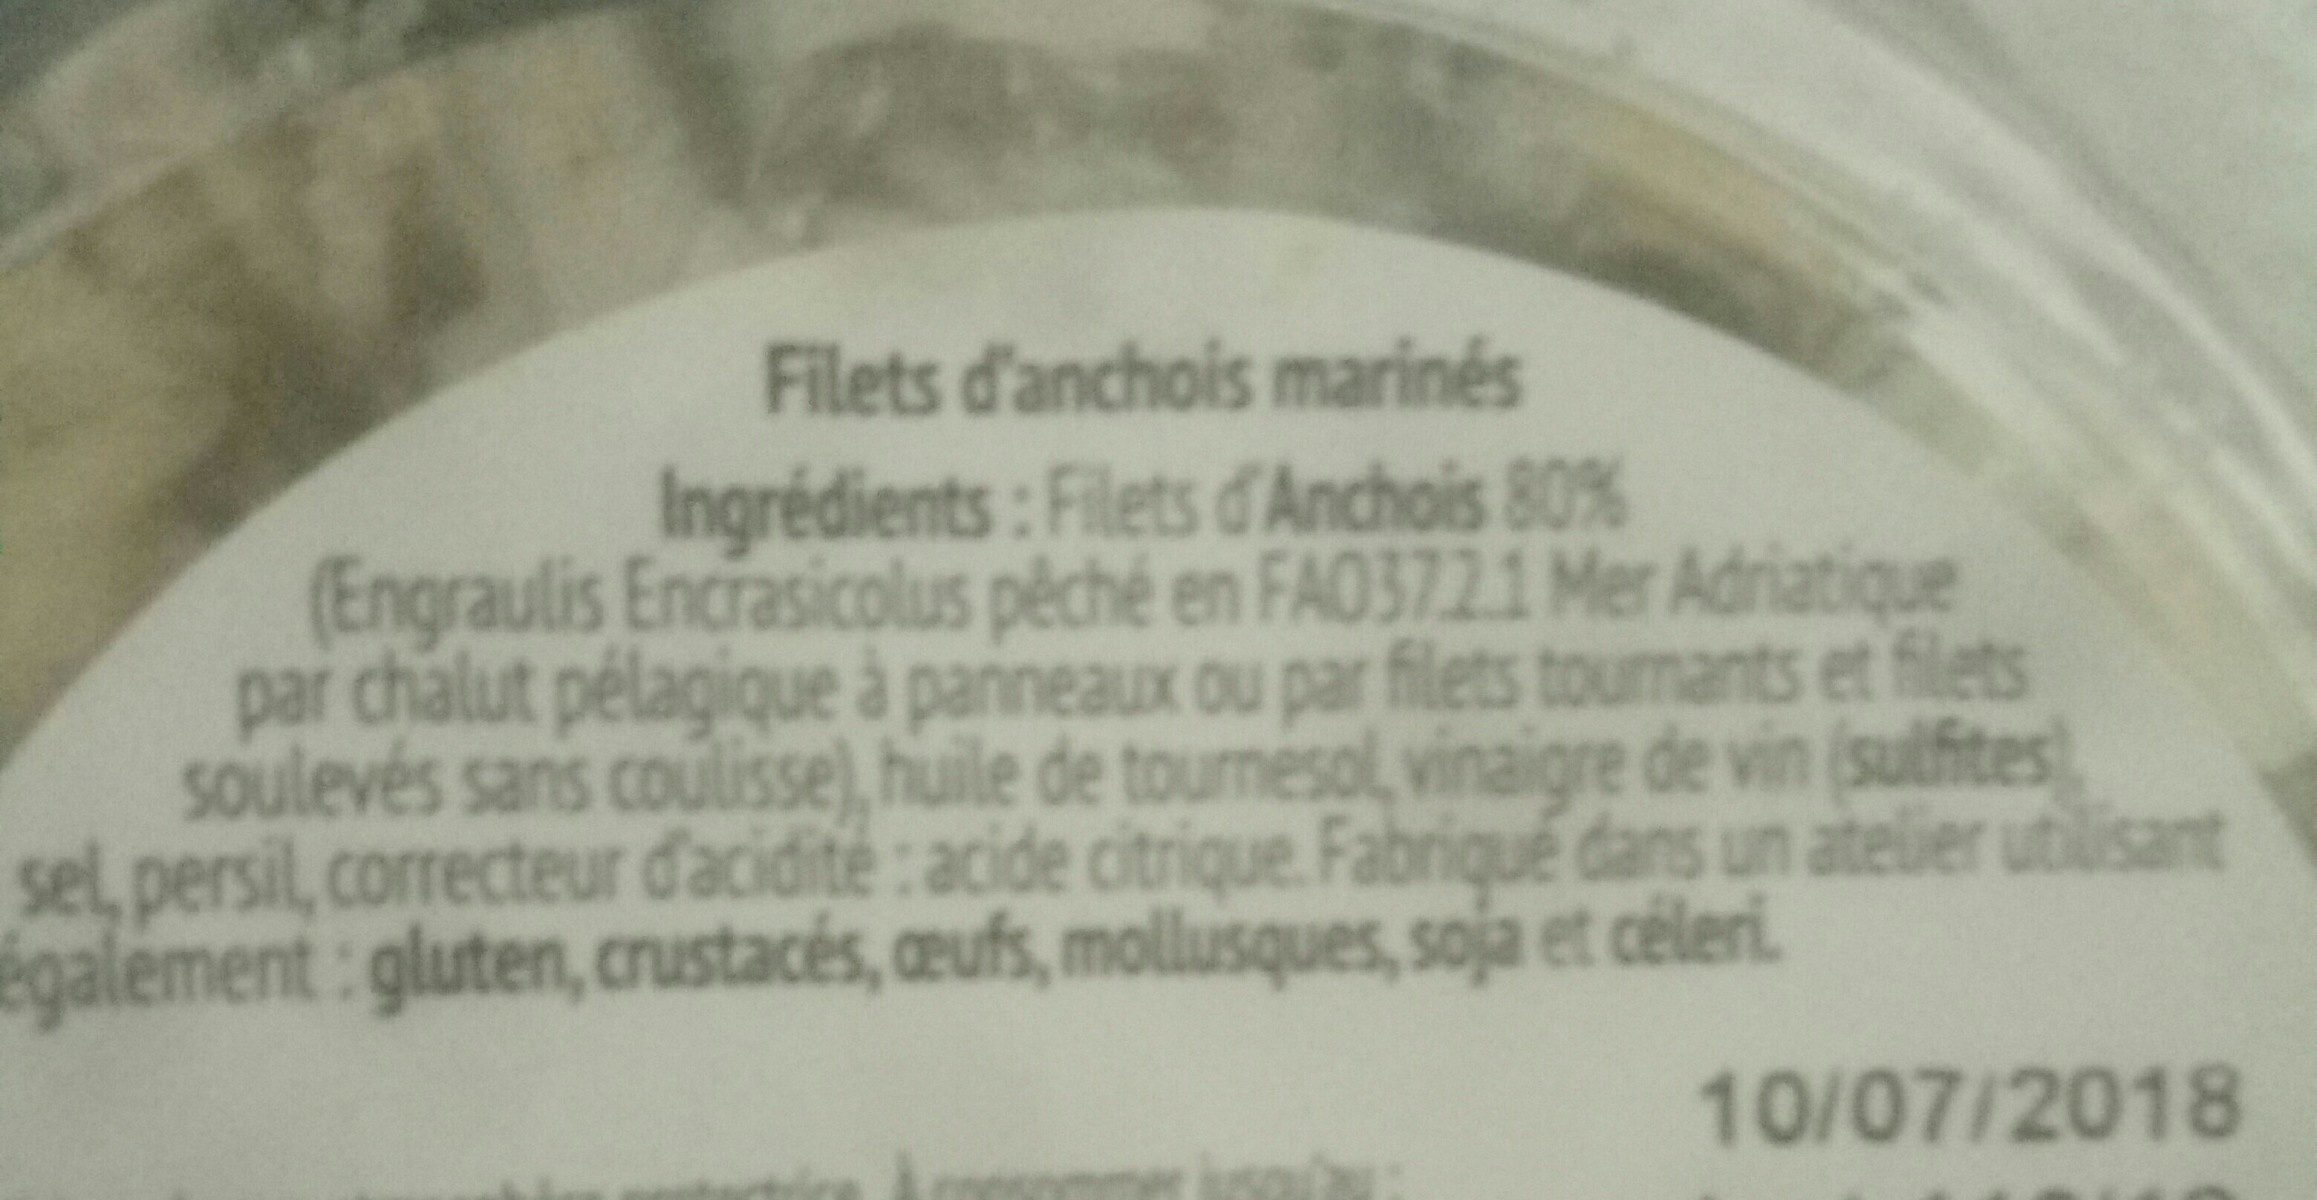 Filets d'anchois - Ingredients - fr